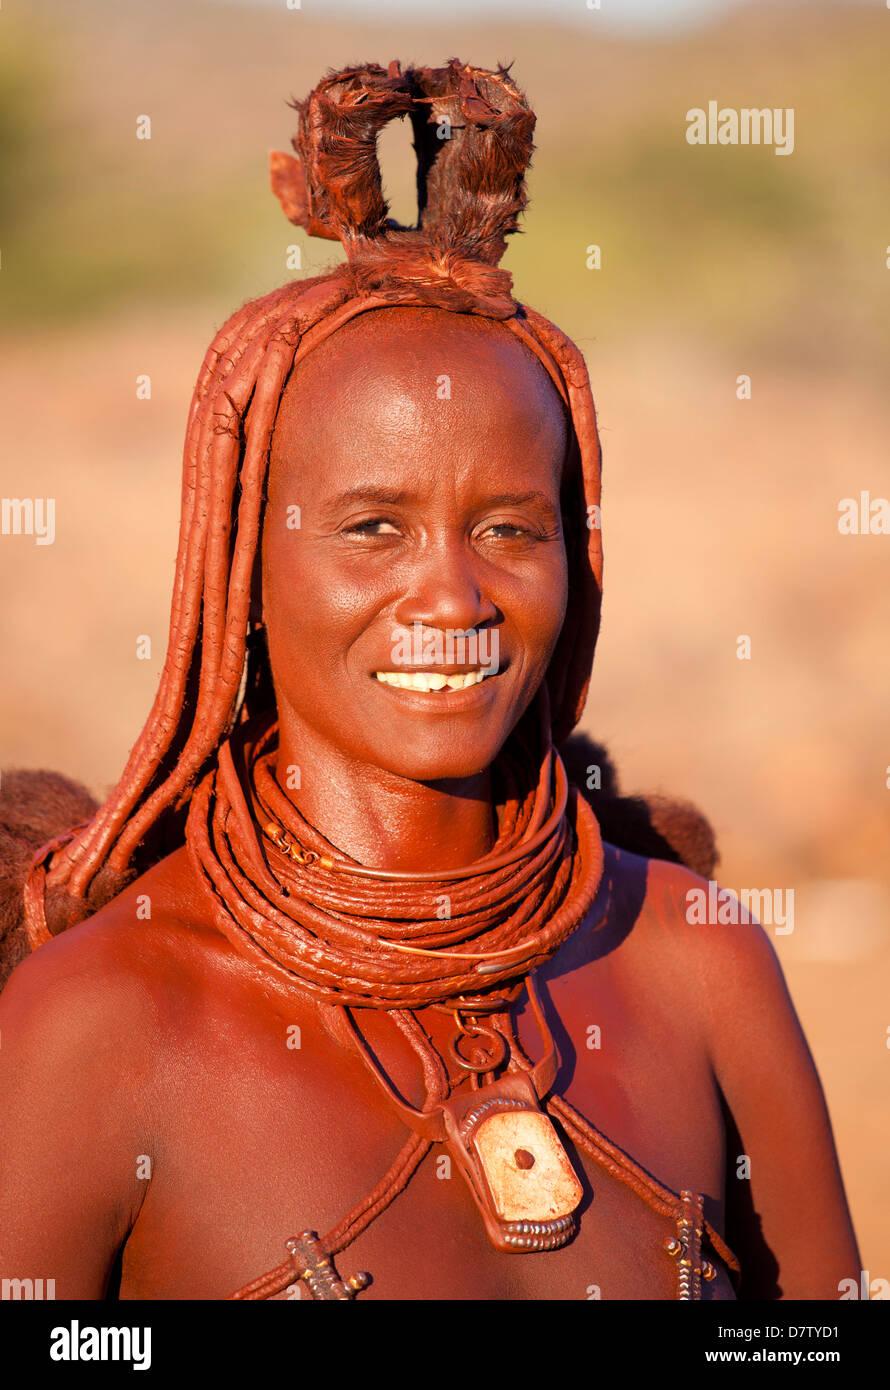 Himba woman inside a mud dwelling hut wearing dress and jewellery and covered in Otjize, Kunene Region, Kaokoland, - Stock Image